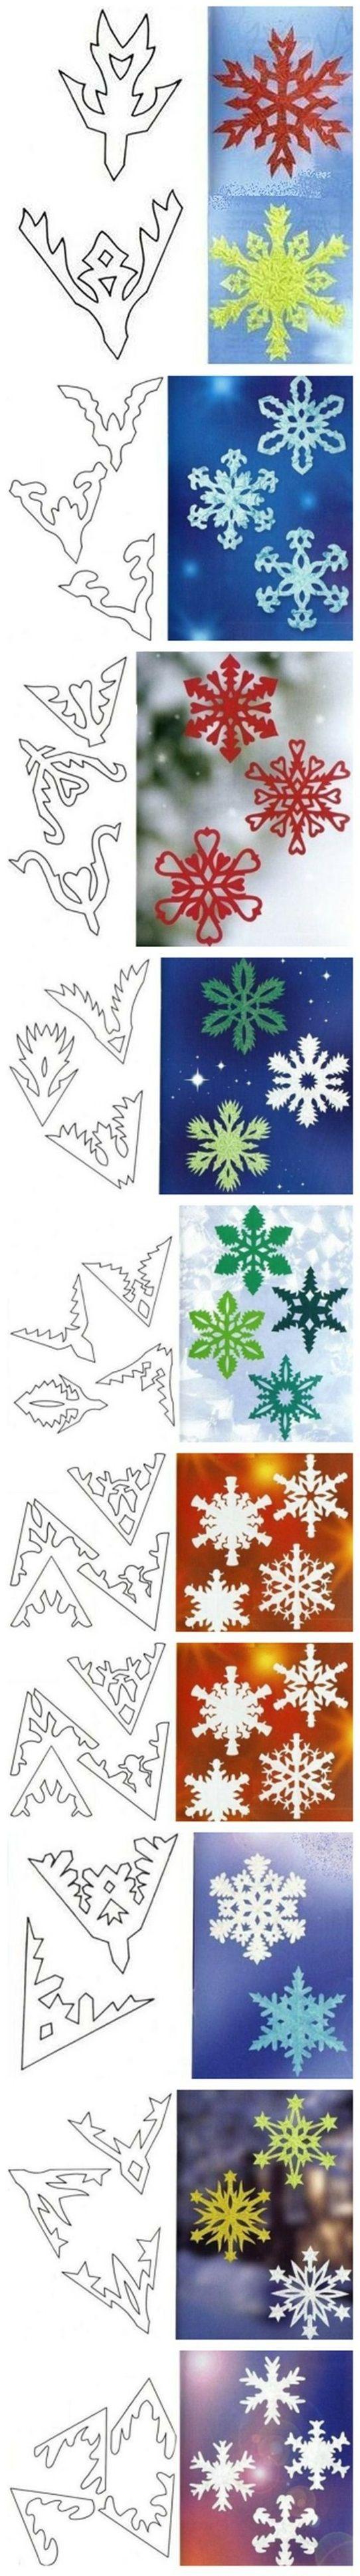 Snowflake Cutout Patterns